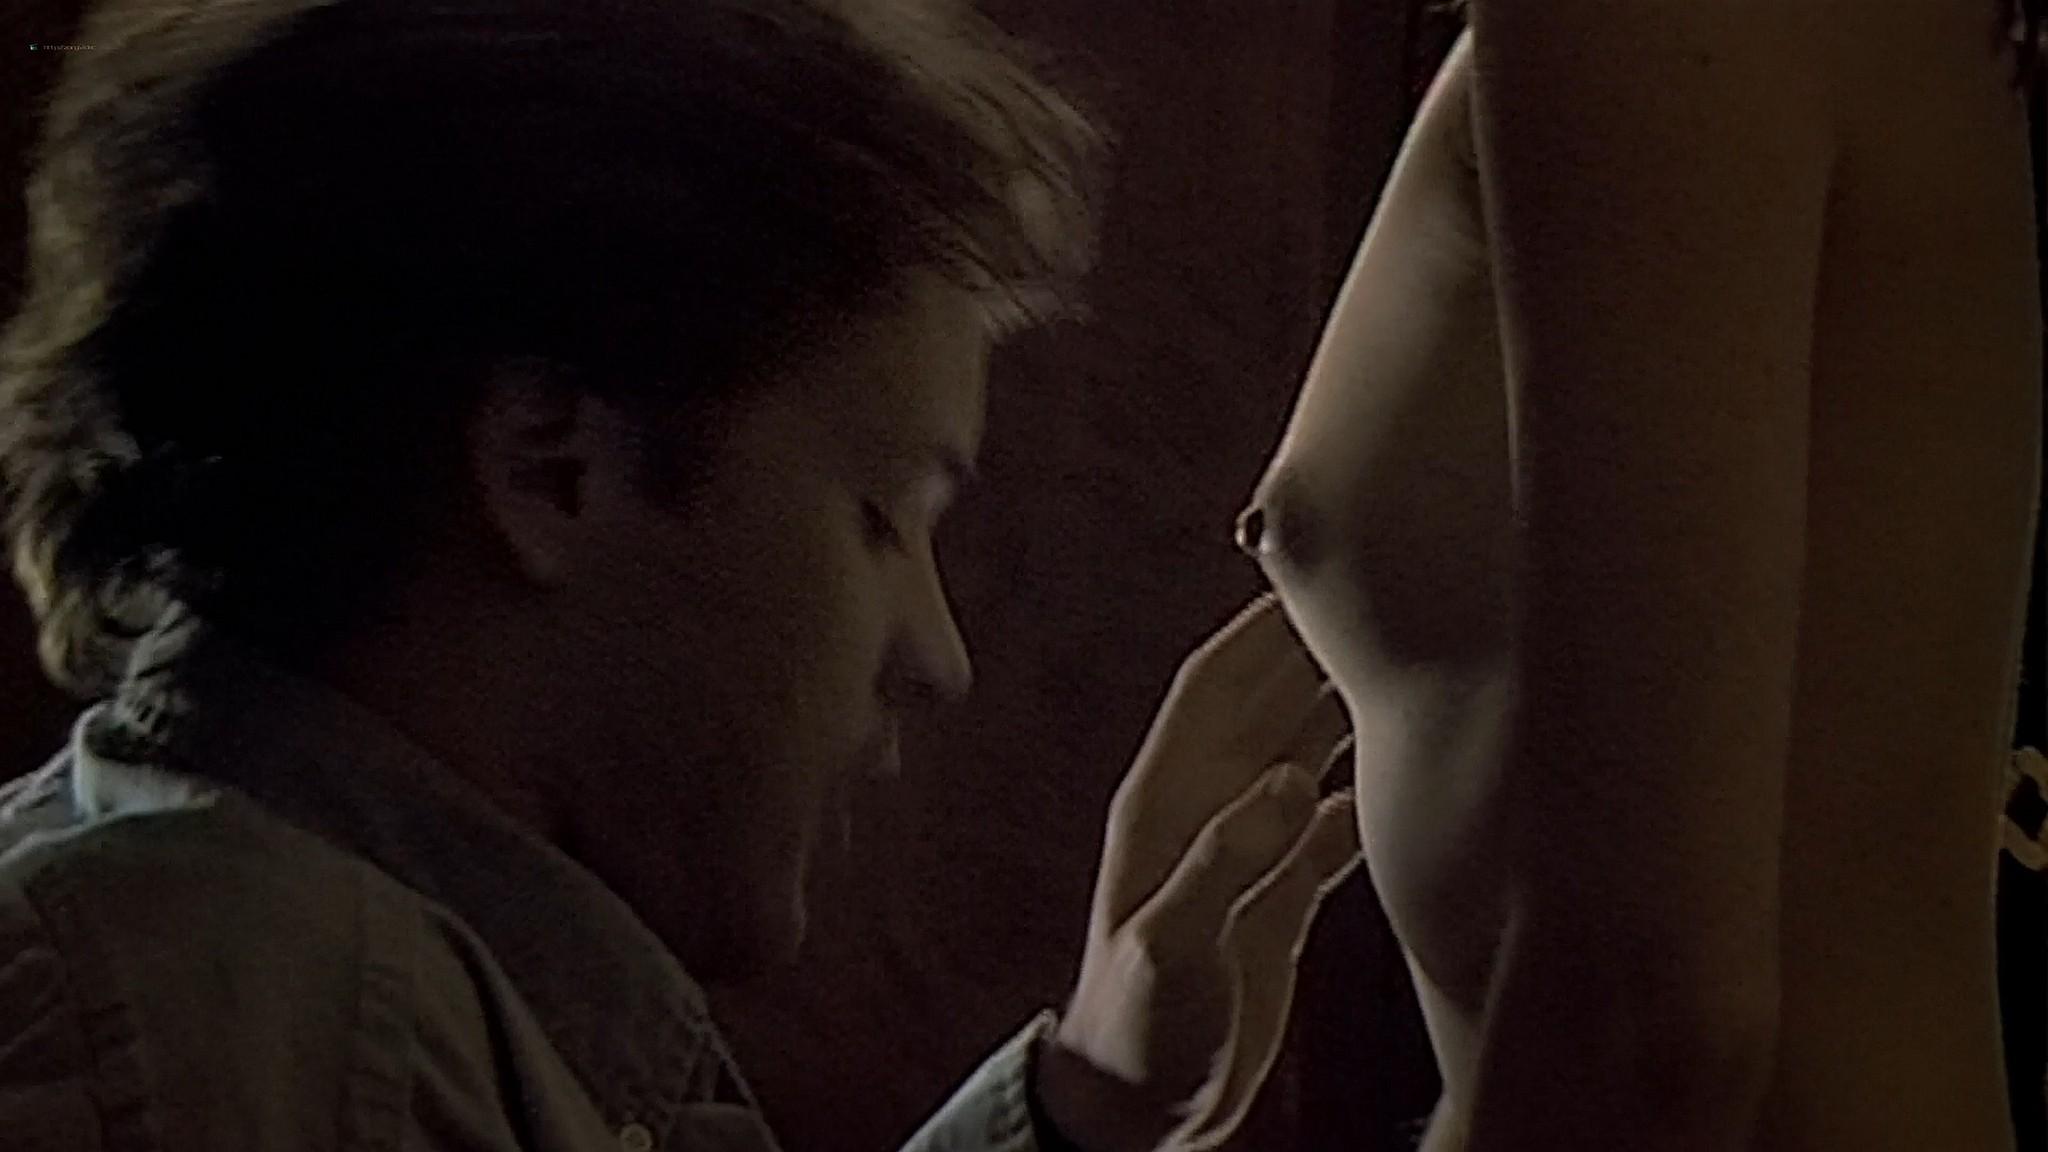 Molly Parker nude sex Alisha Klass explicit Carla Gugino sexy The Center of the World 2001 1080p 7